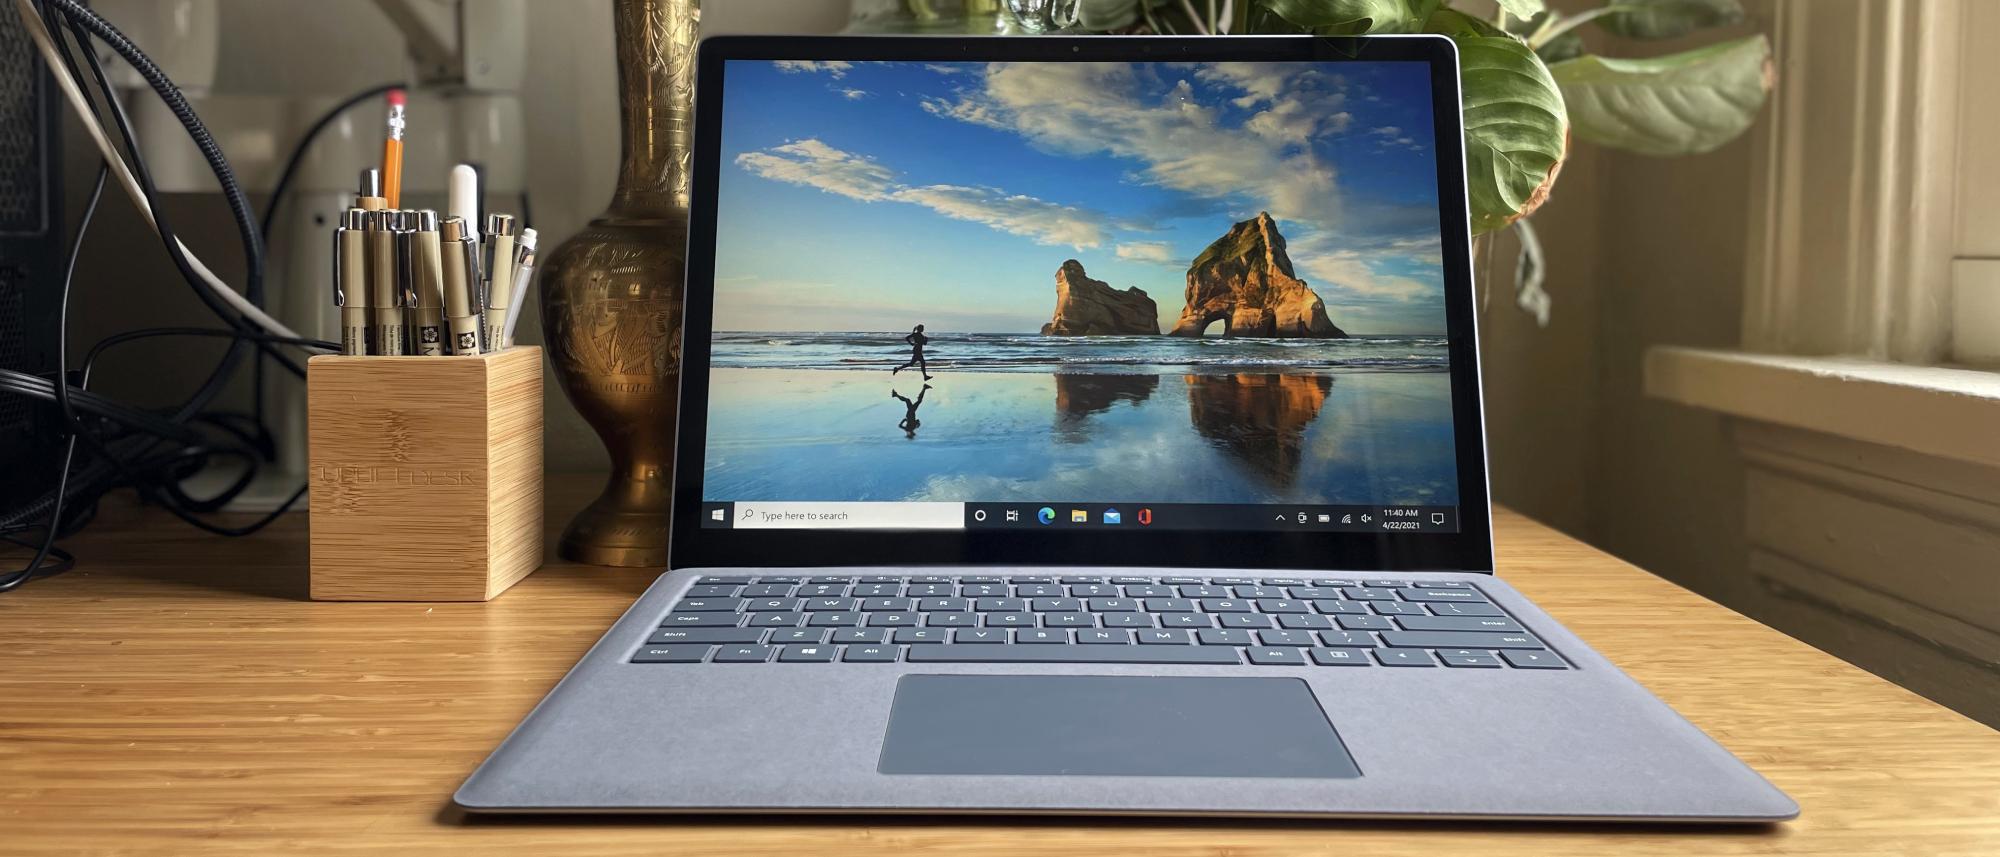 https://www.tomsguide.com/reviews/microsoft-surface-laptop-4